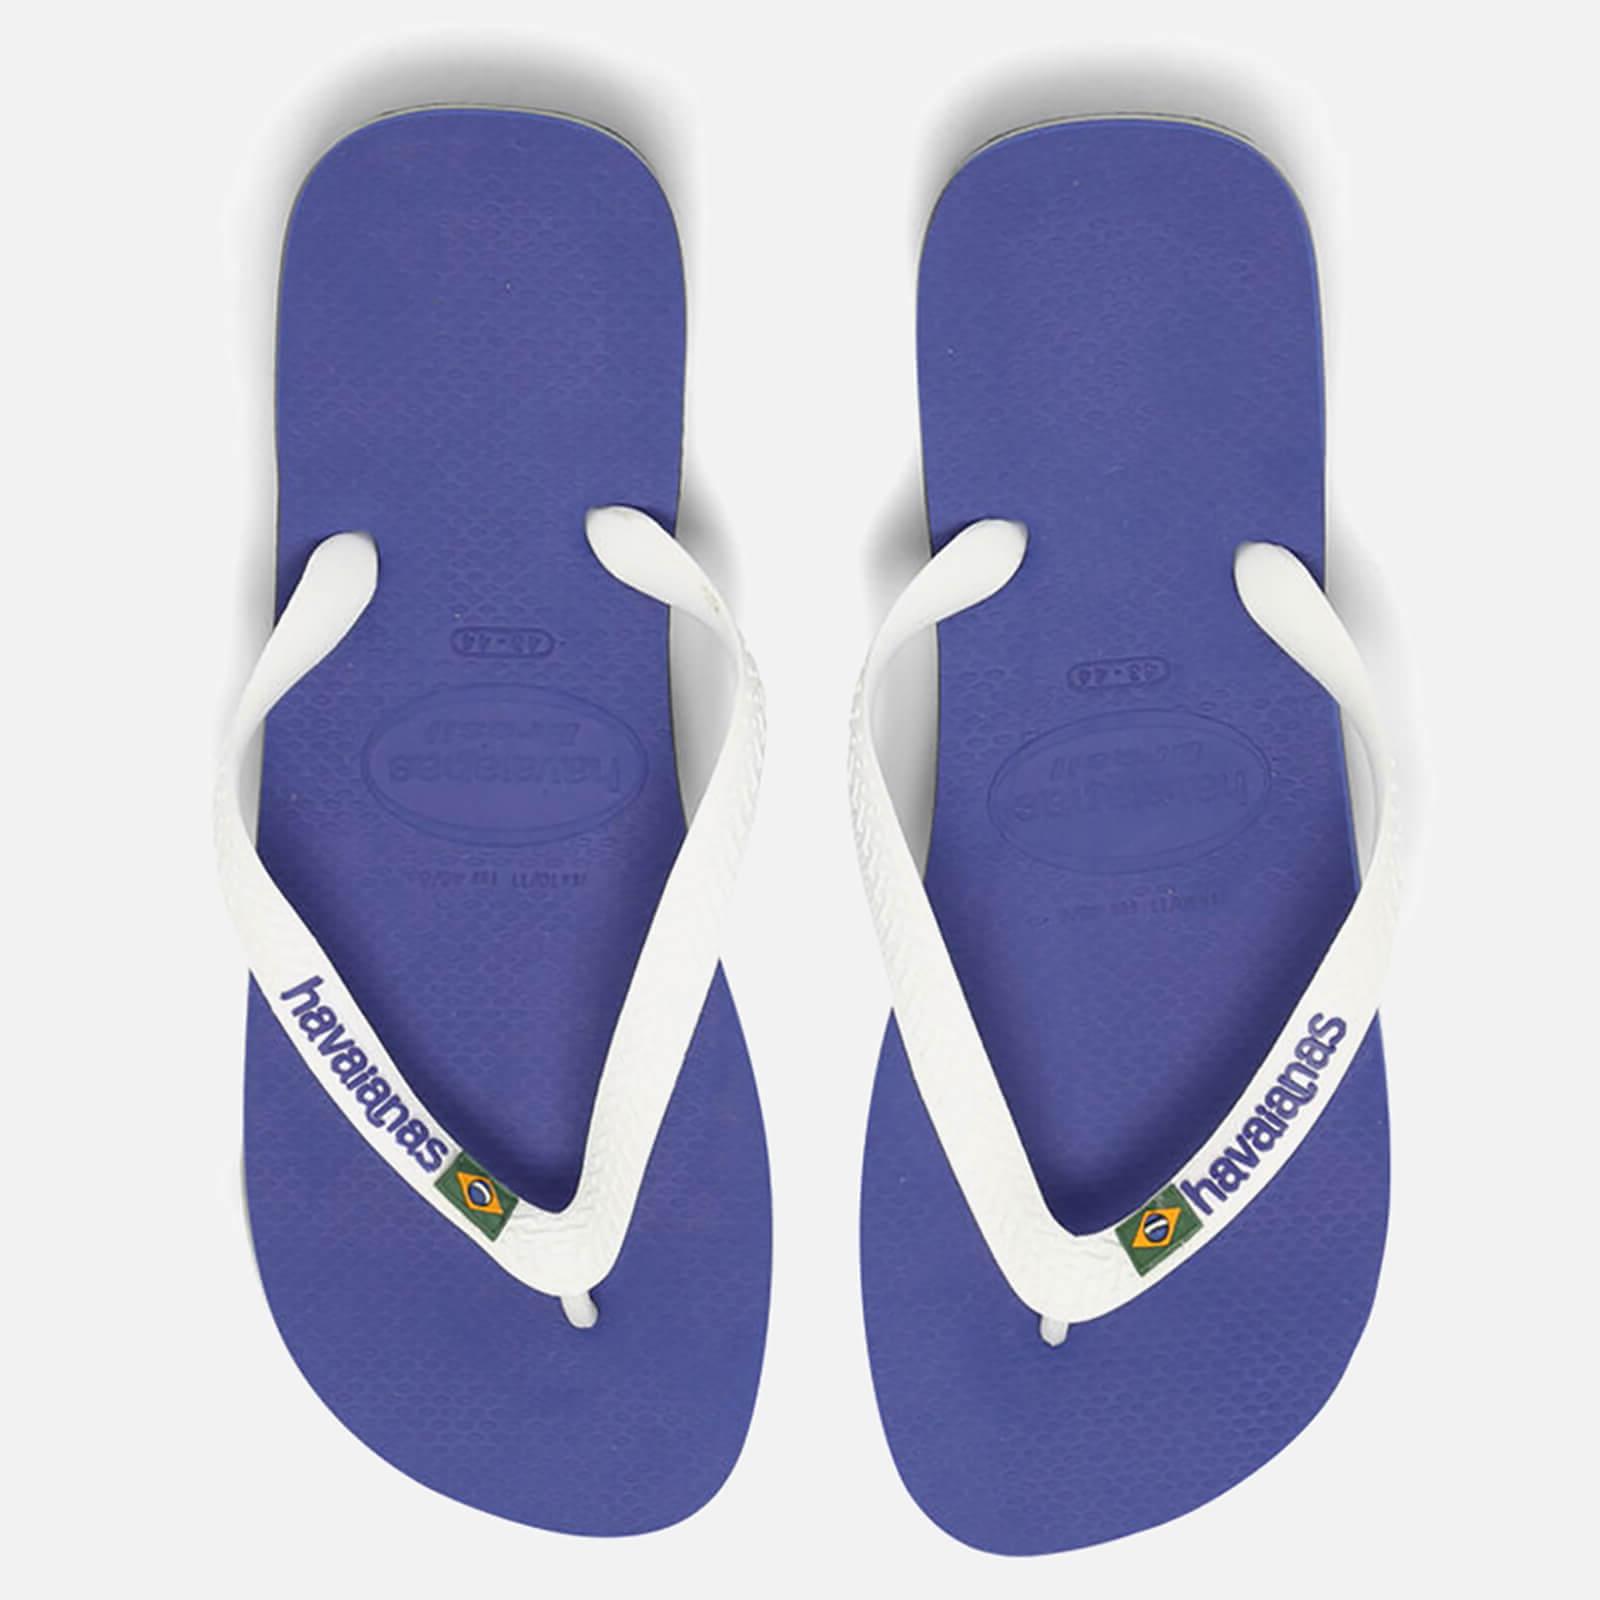 483bd812e3fa Havaianas Brasil Logo Flip Flops - Marine Blue Womens Footwear ...